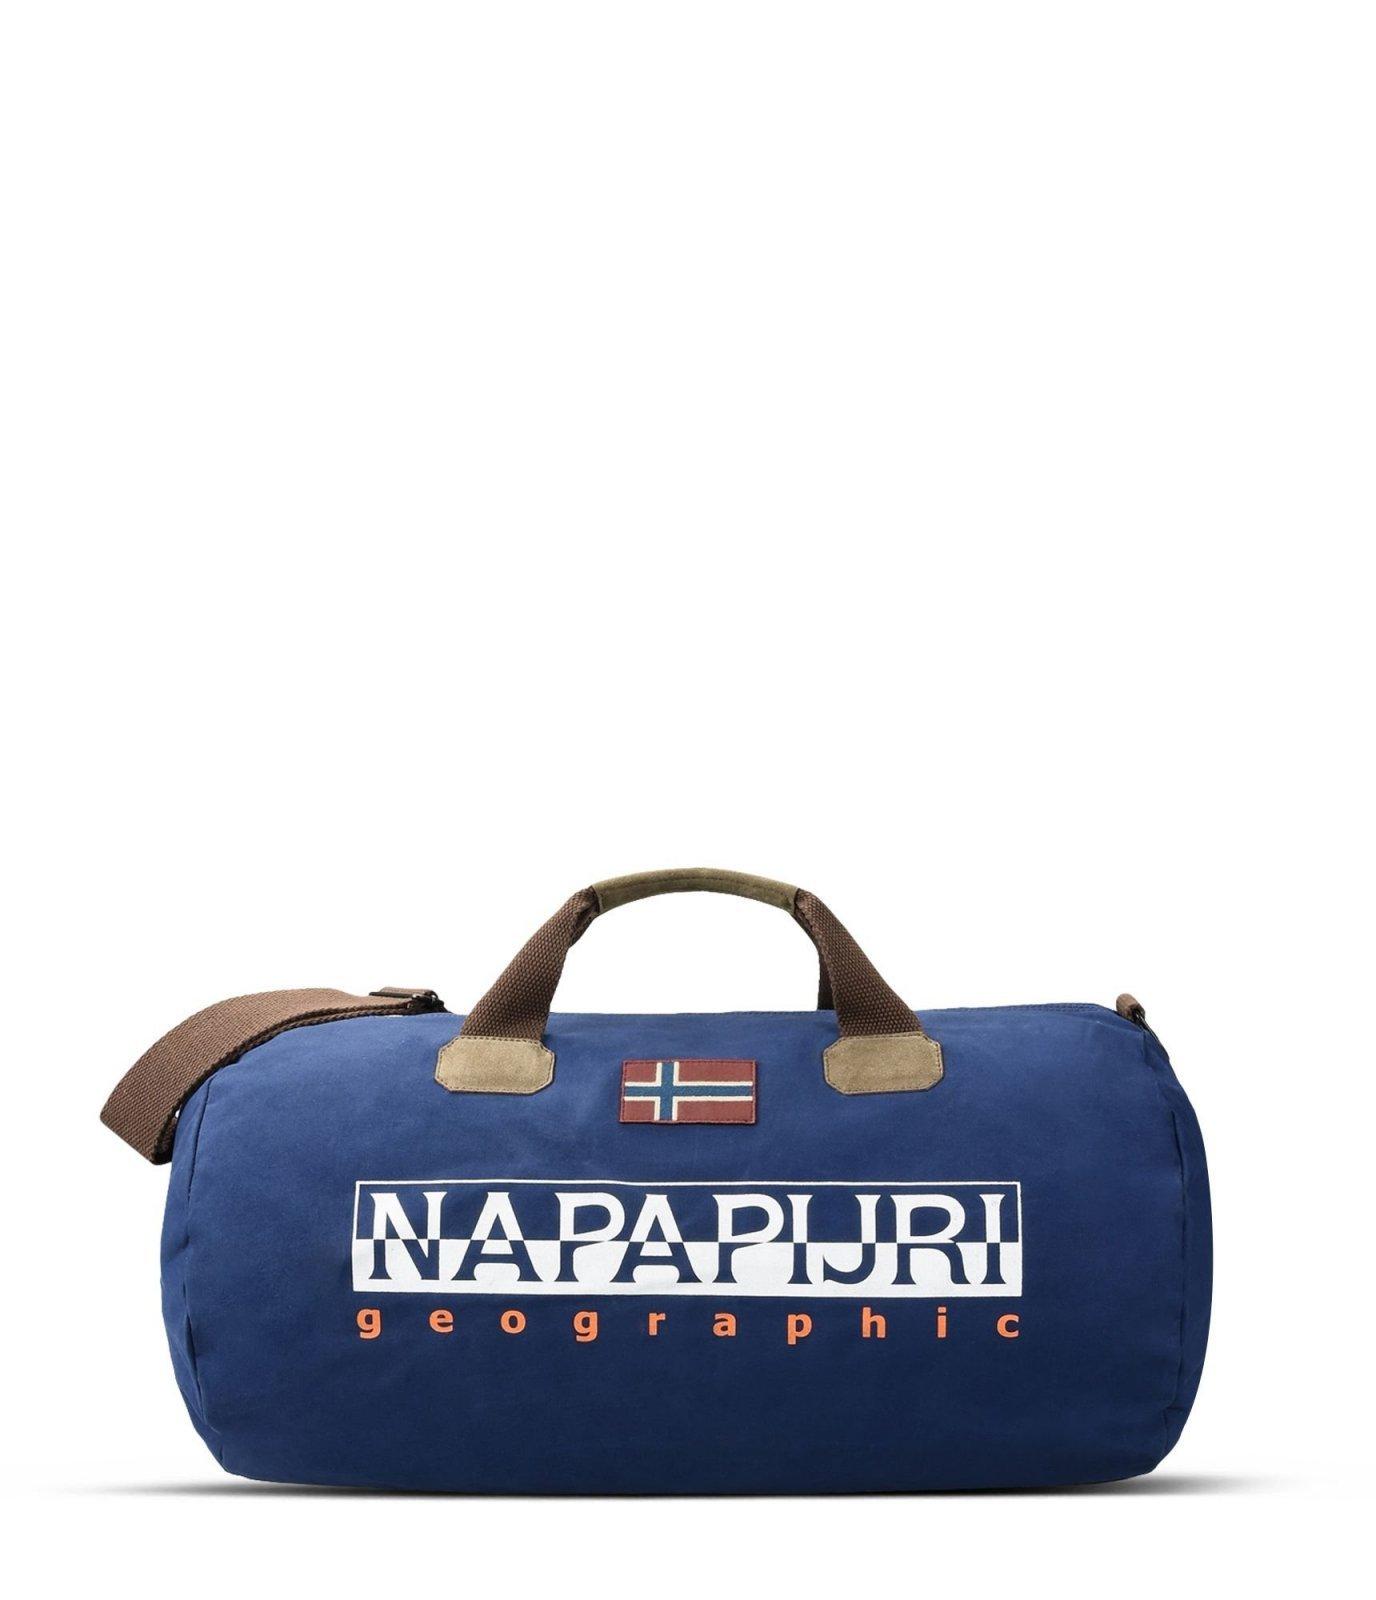 Napapijri Bering Duffle Bag One Size Blue Depths